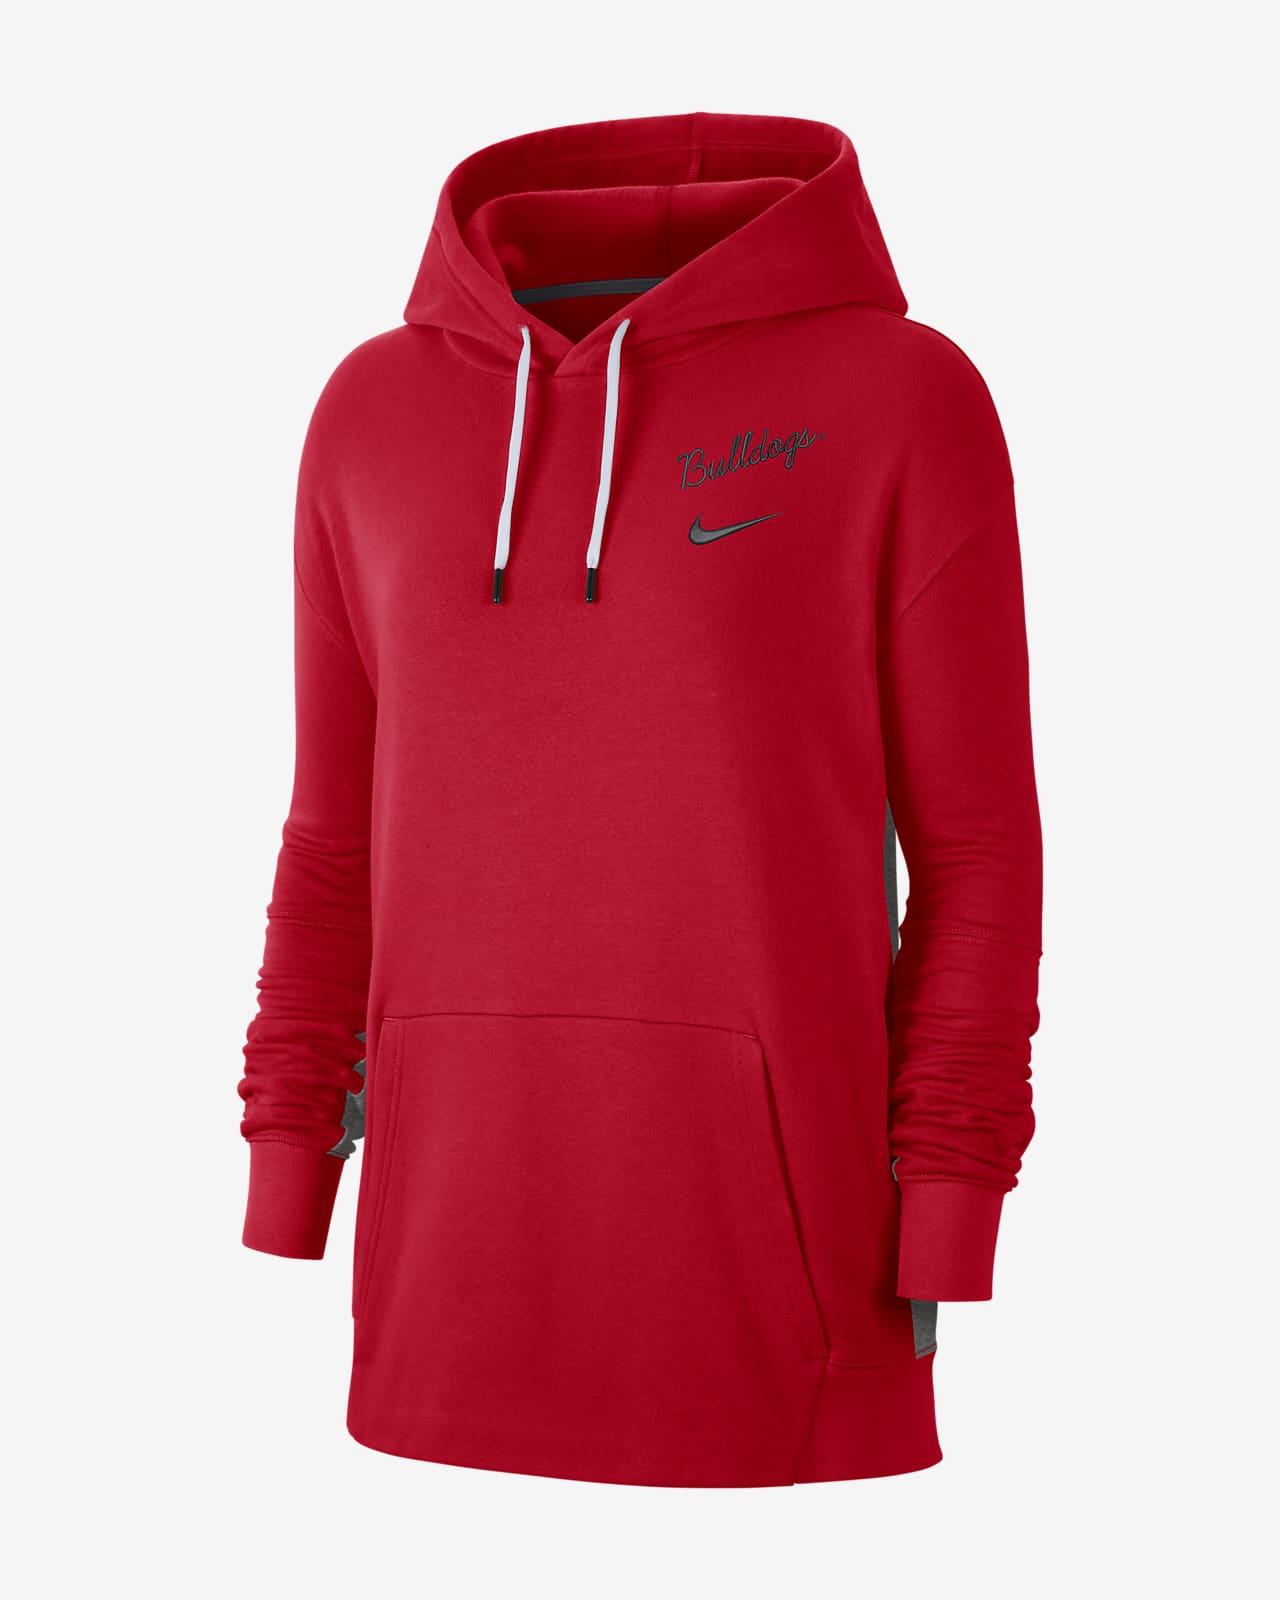 Nike College (Georgia) Women's Fleece Pullover Hoodie